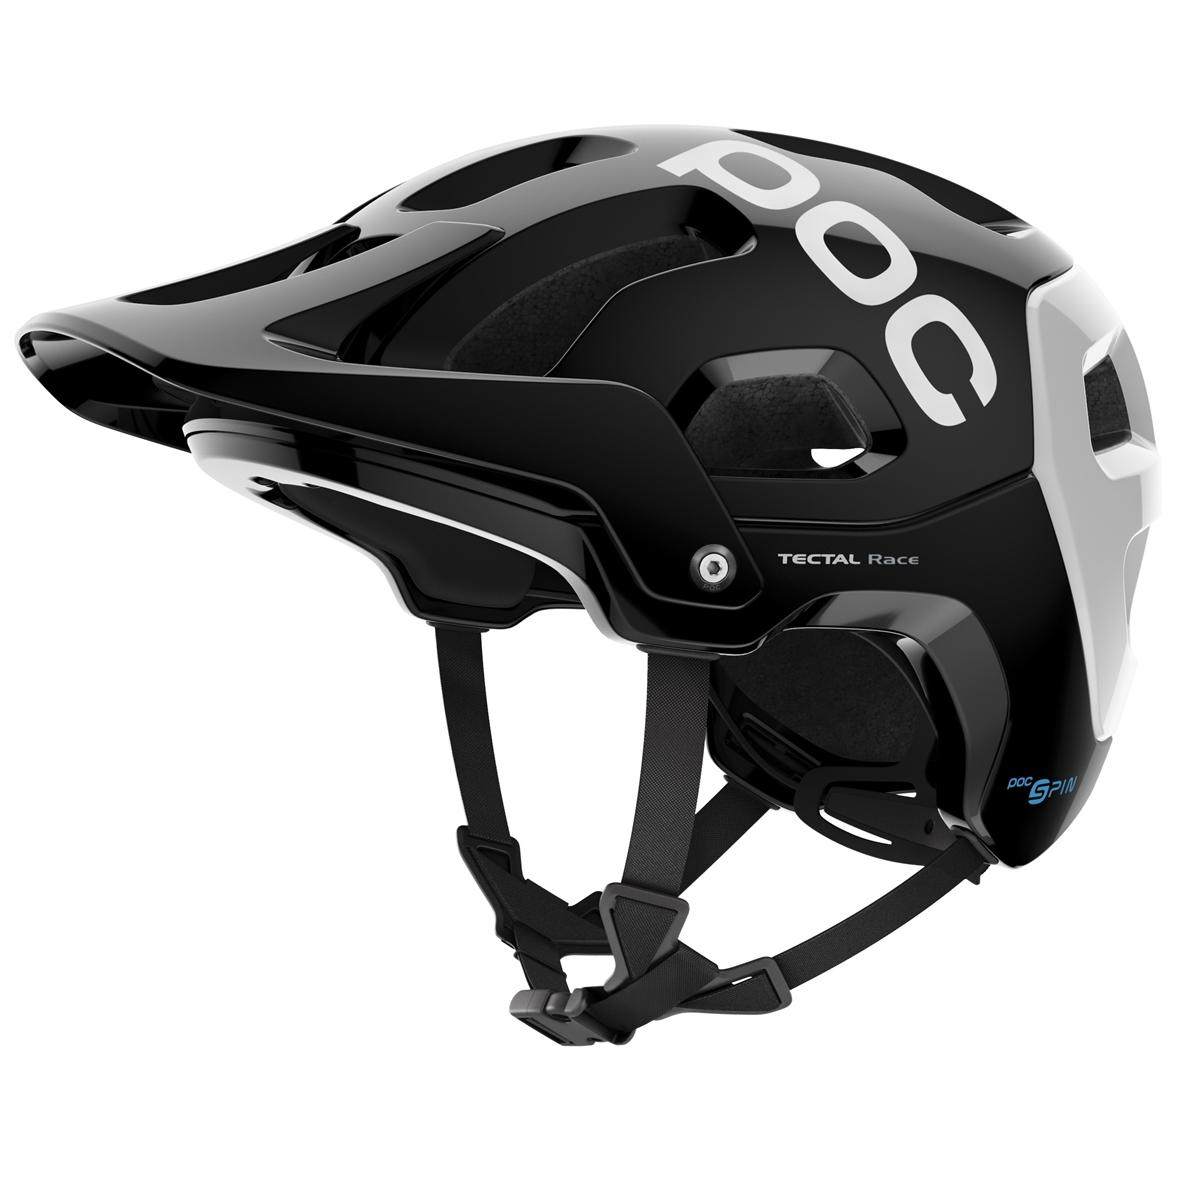 Enduro helmet Tectal Race Spin black size XS-S (51-54cm)